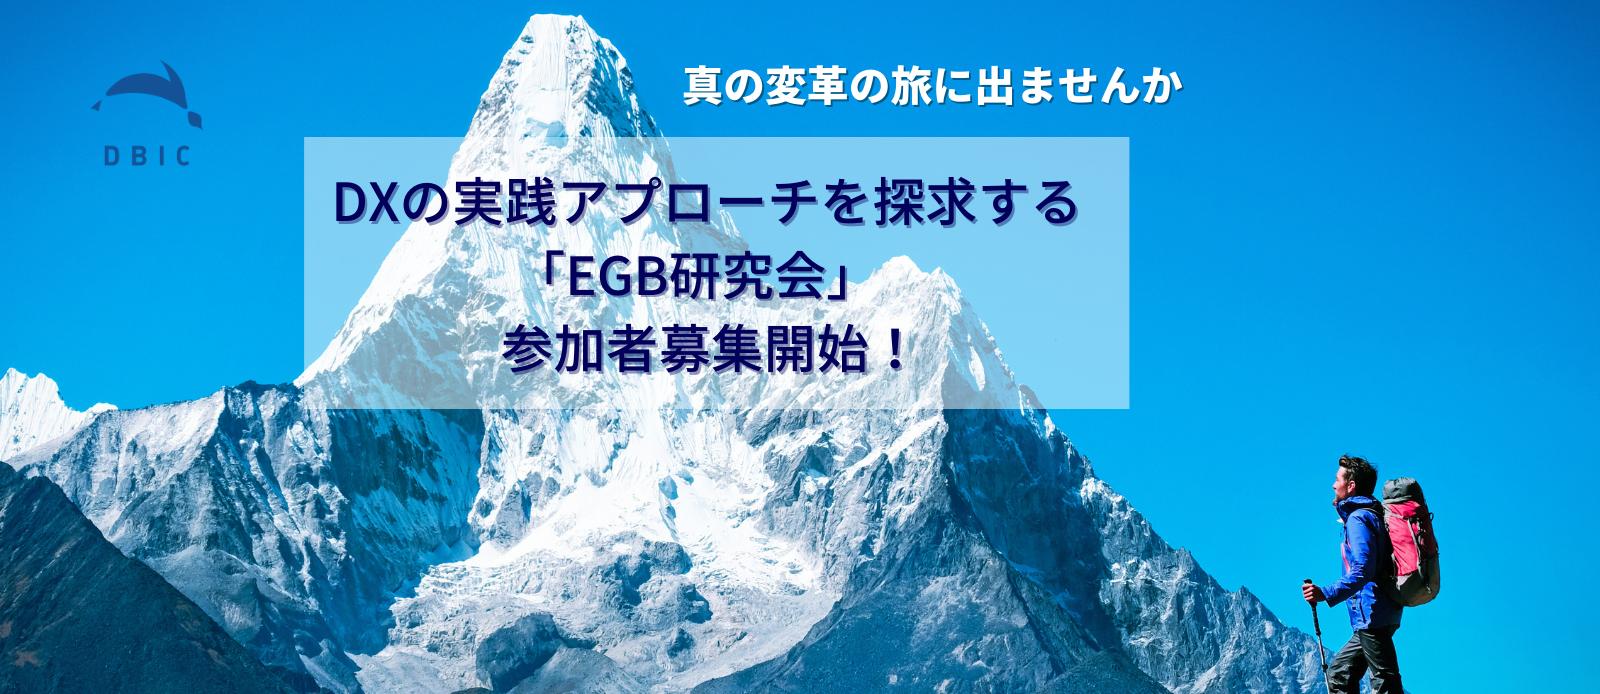 DXの実践アプローチを探求する「EGB研究会」 参加者募集開始!